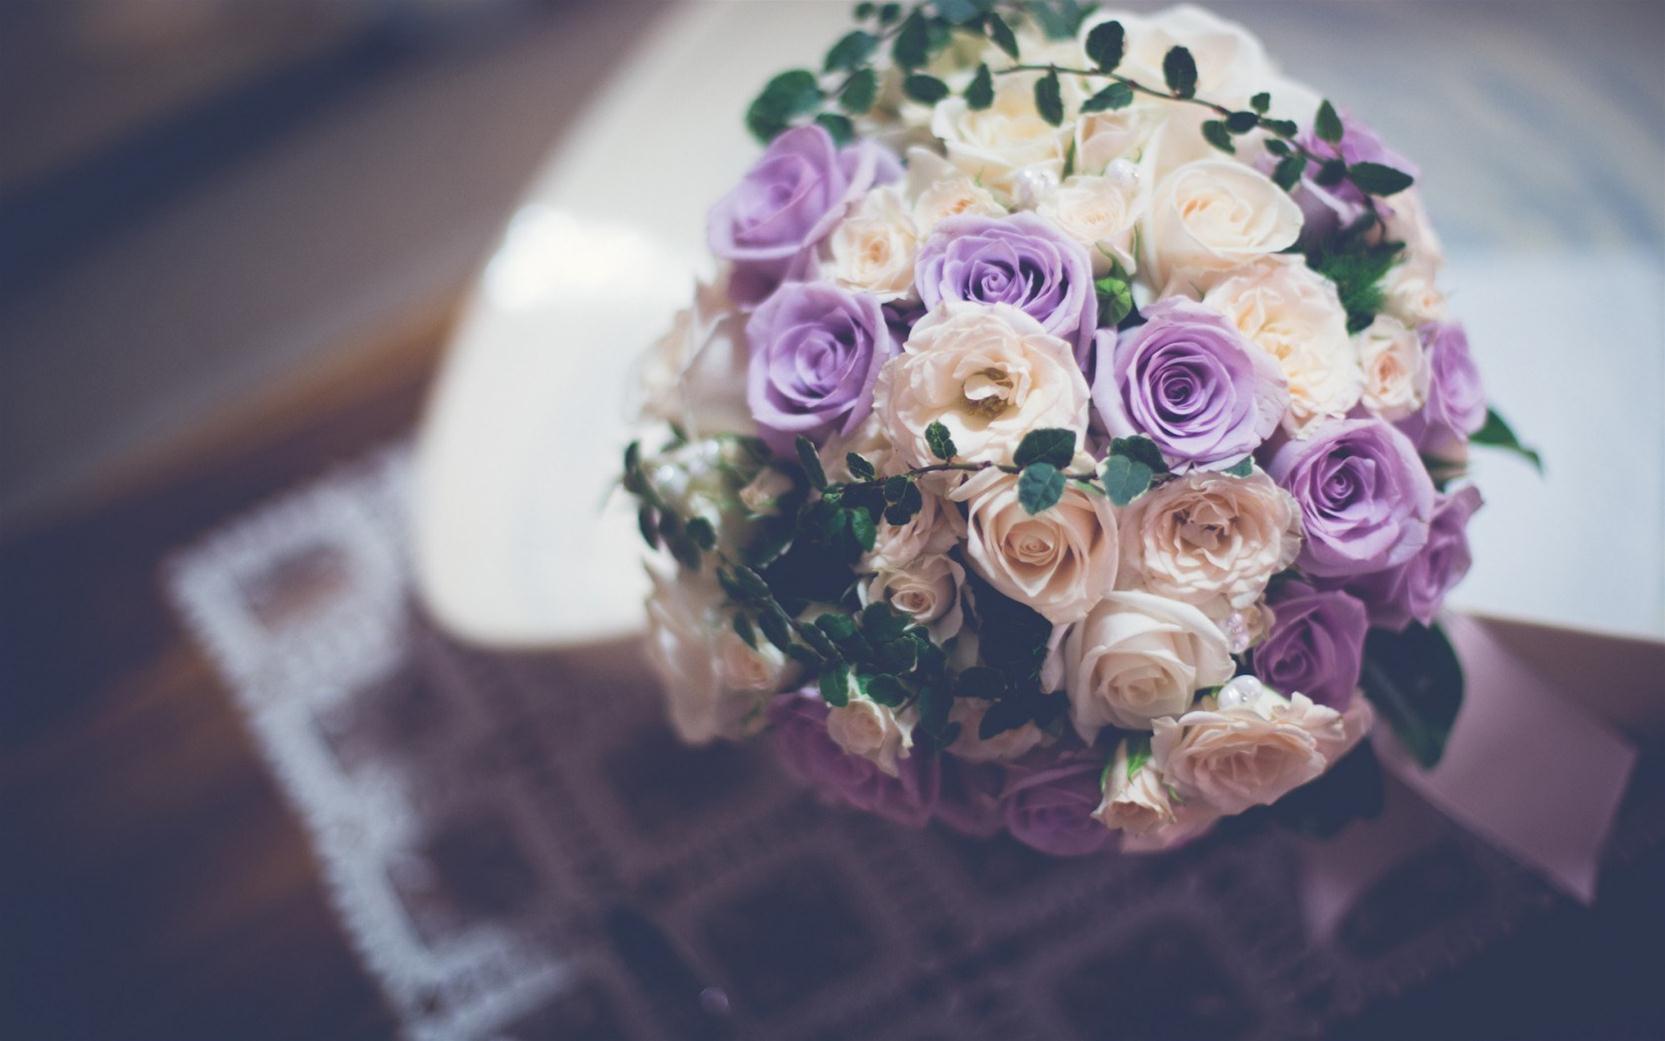 Weddings janets flowers florist eastbourne izmirmasajfo